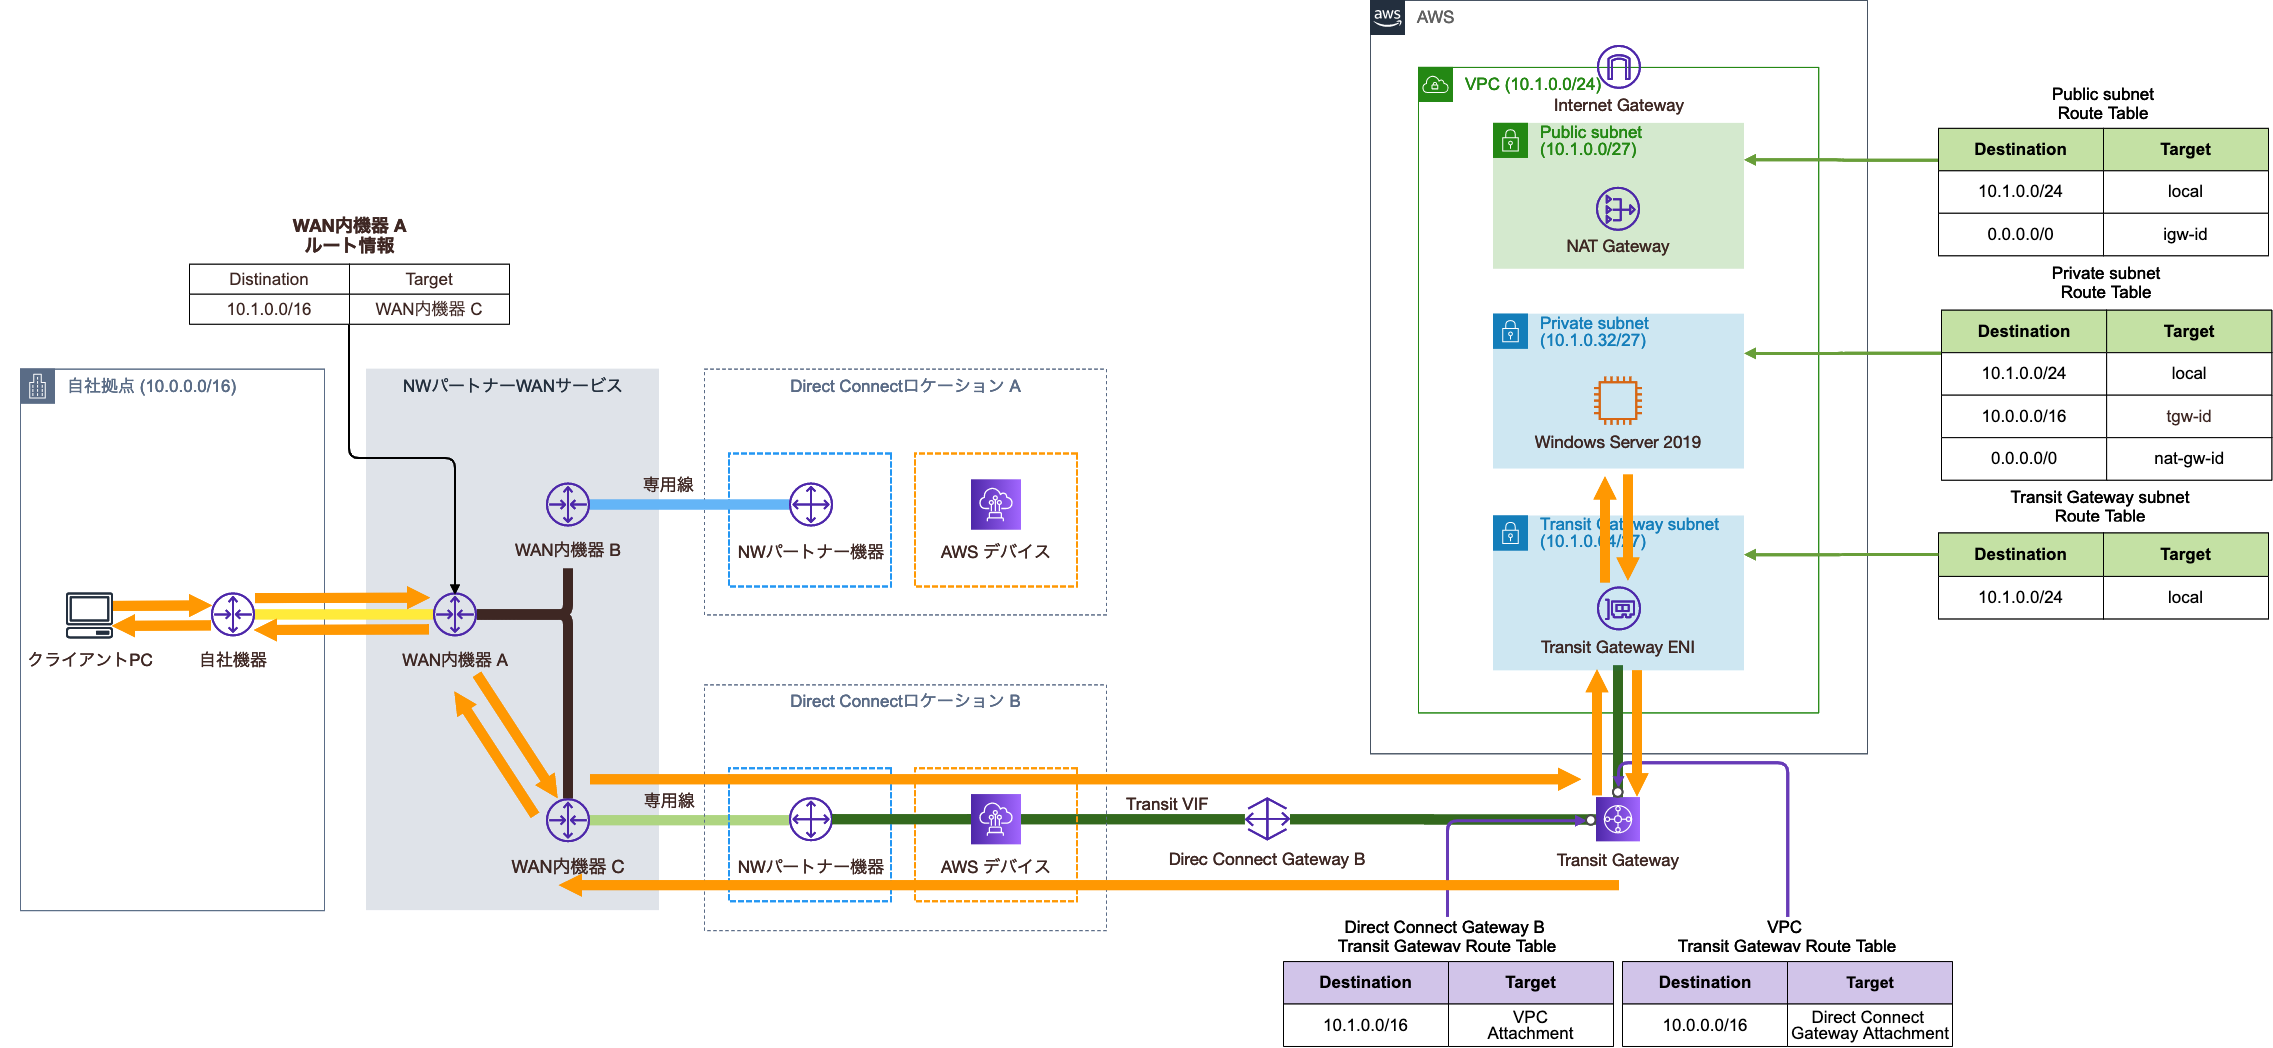 Direct Connect Gateway削除後の構成図